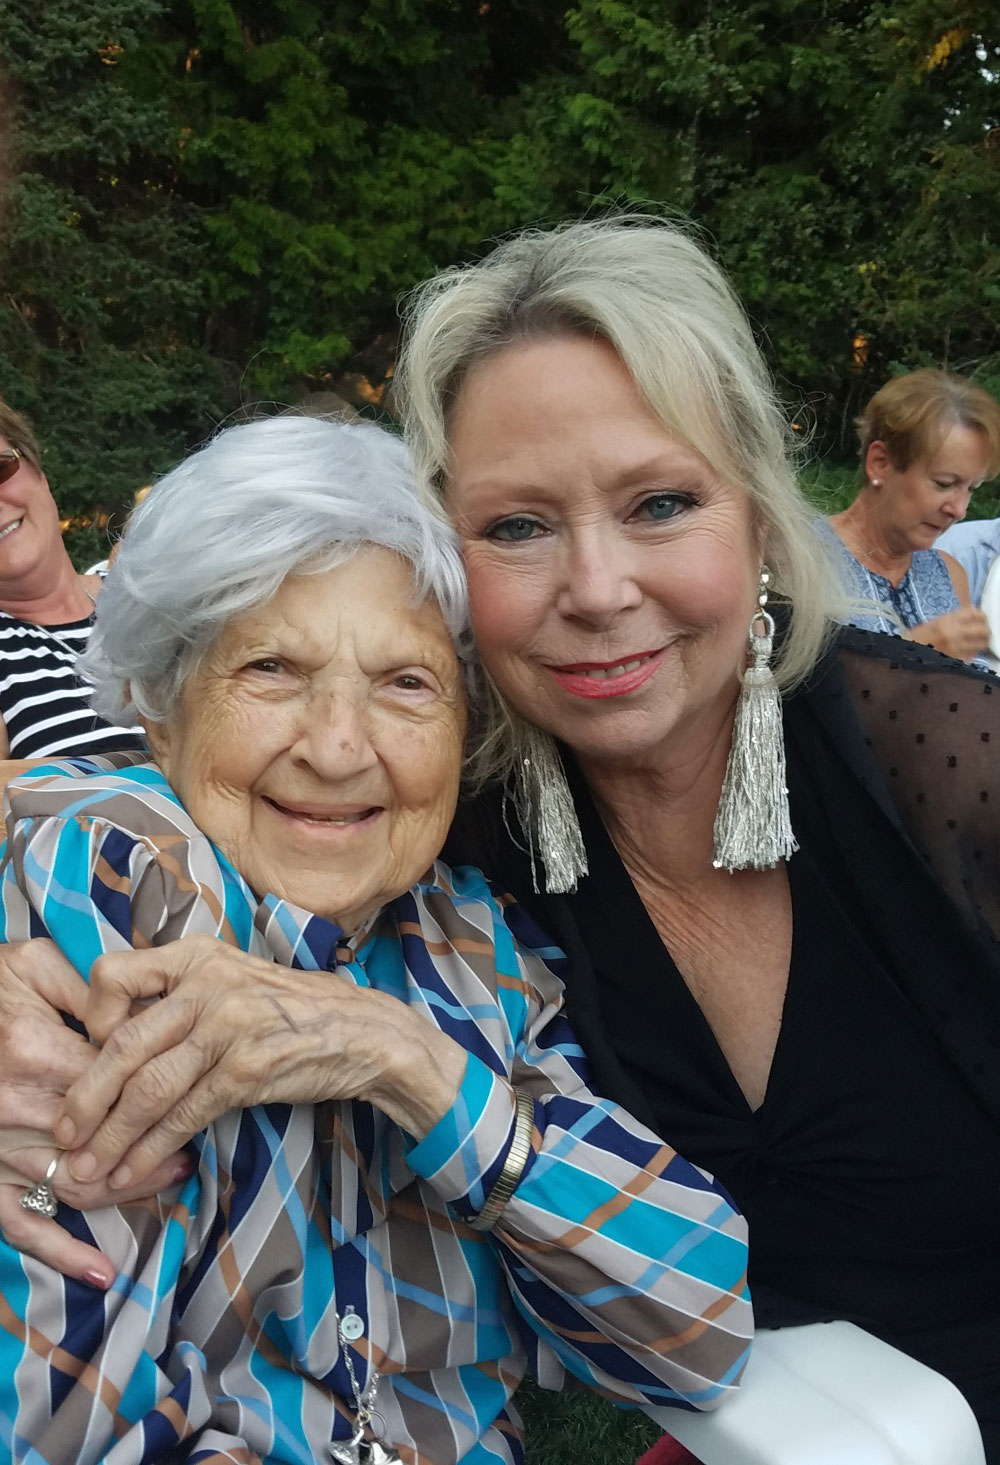 Rio Sandidge and Aurora Vaentinetti' at RLS Productions 2019 Concerts in the Gardens